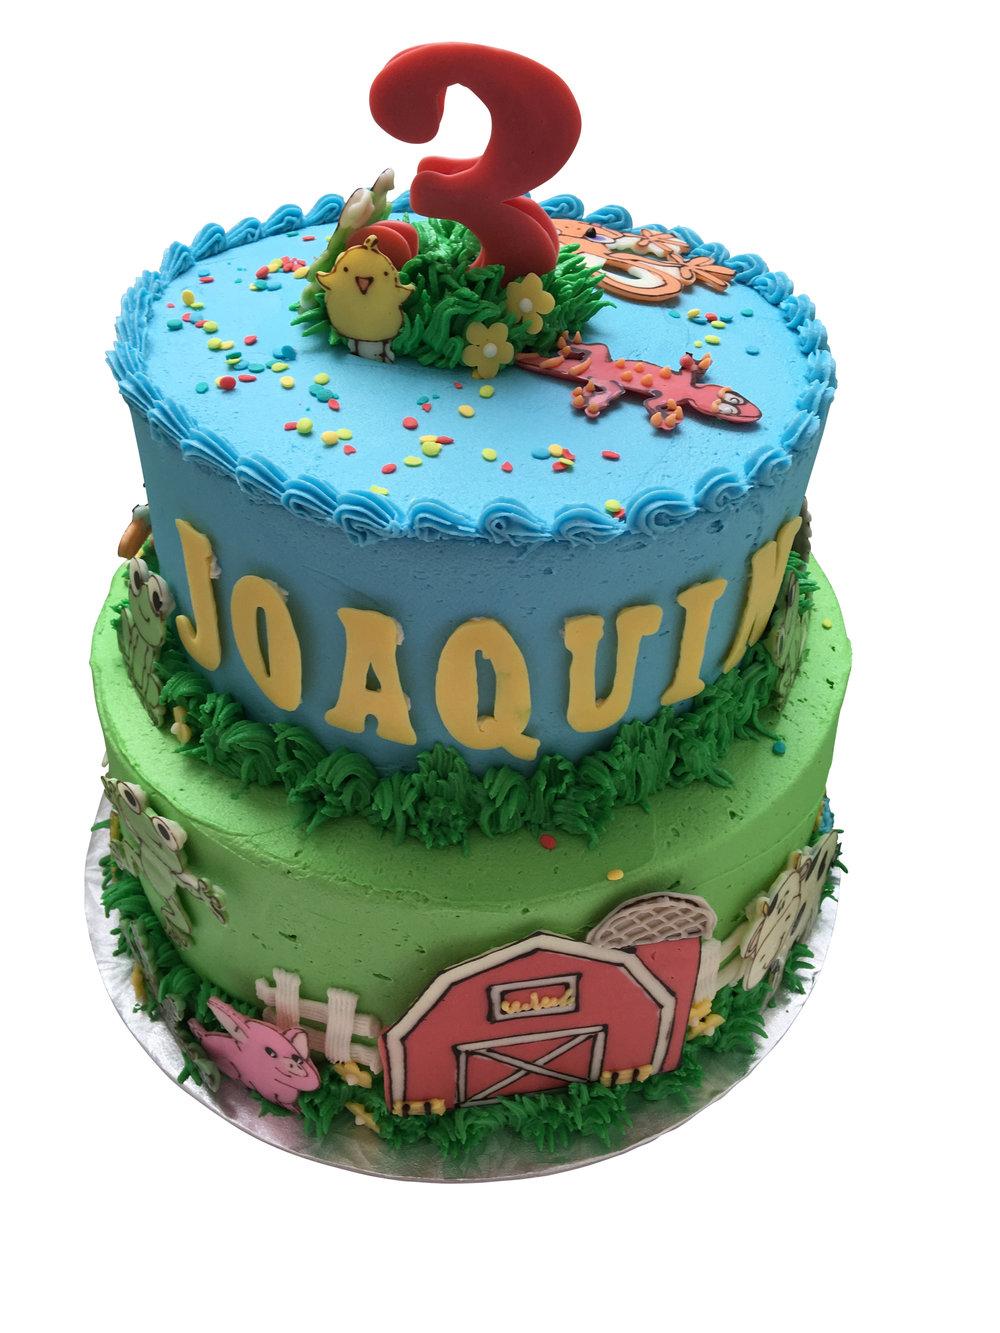 BeBe-Cakes-Farm-Cake.jpg